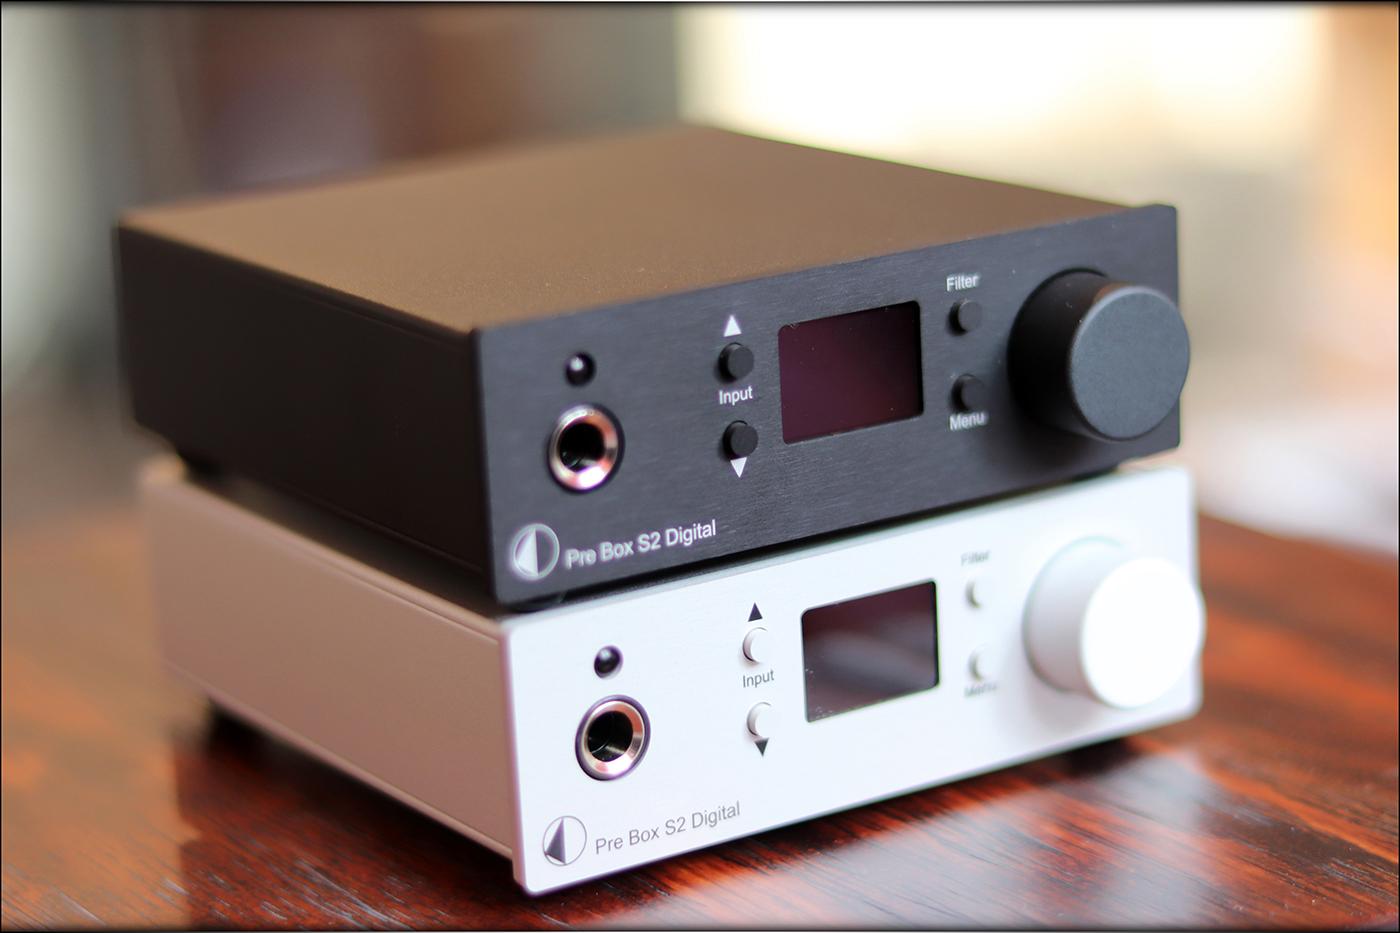 Pro-Ject-Pre-Box-S2-Digital-DAC-AMP-Headphone-Desktop-Audiophile-Heaven-Review-35.jpg